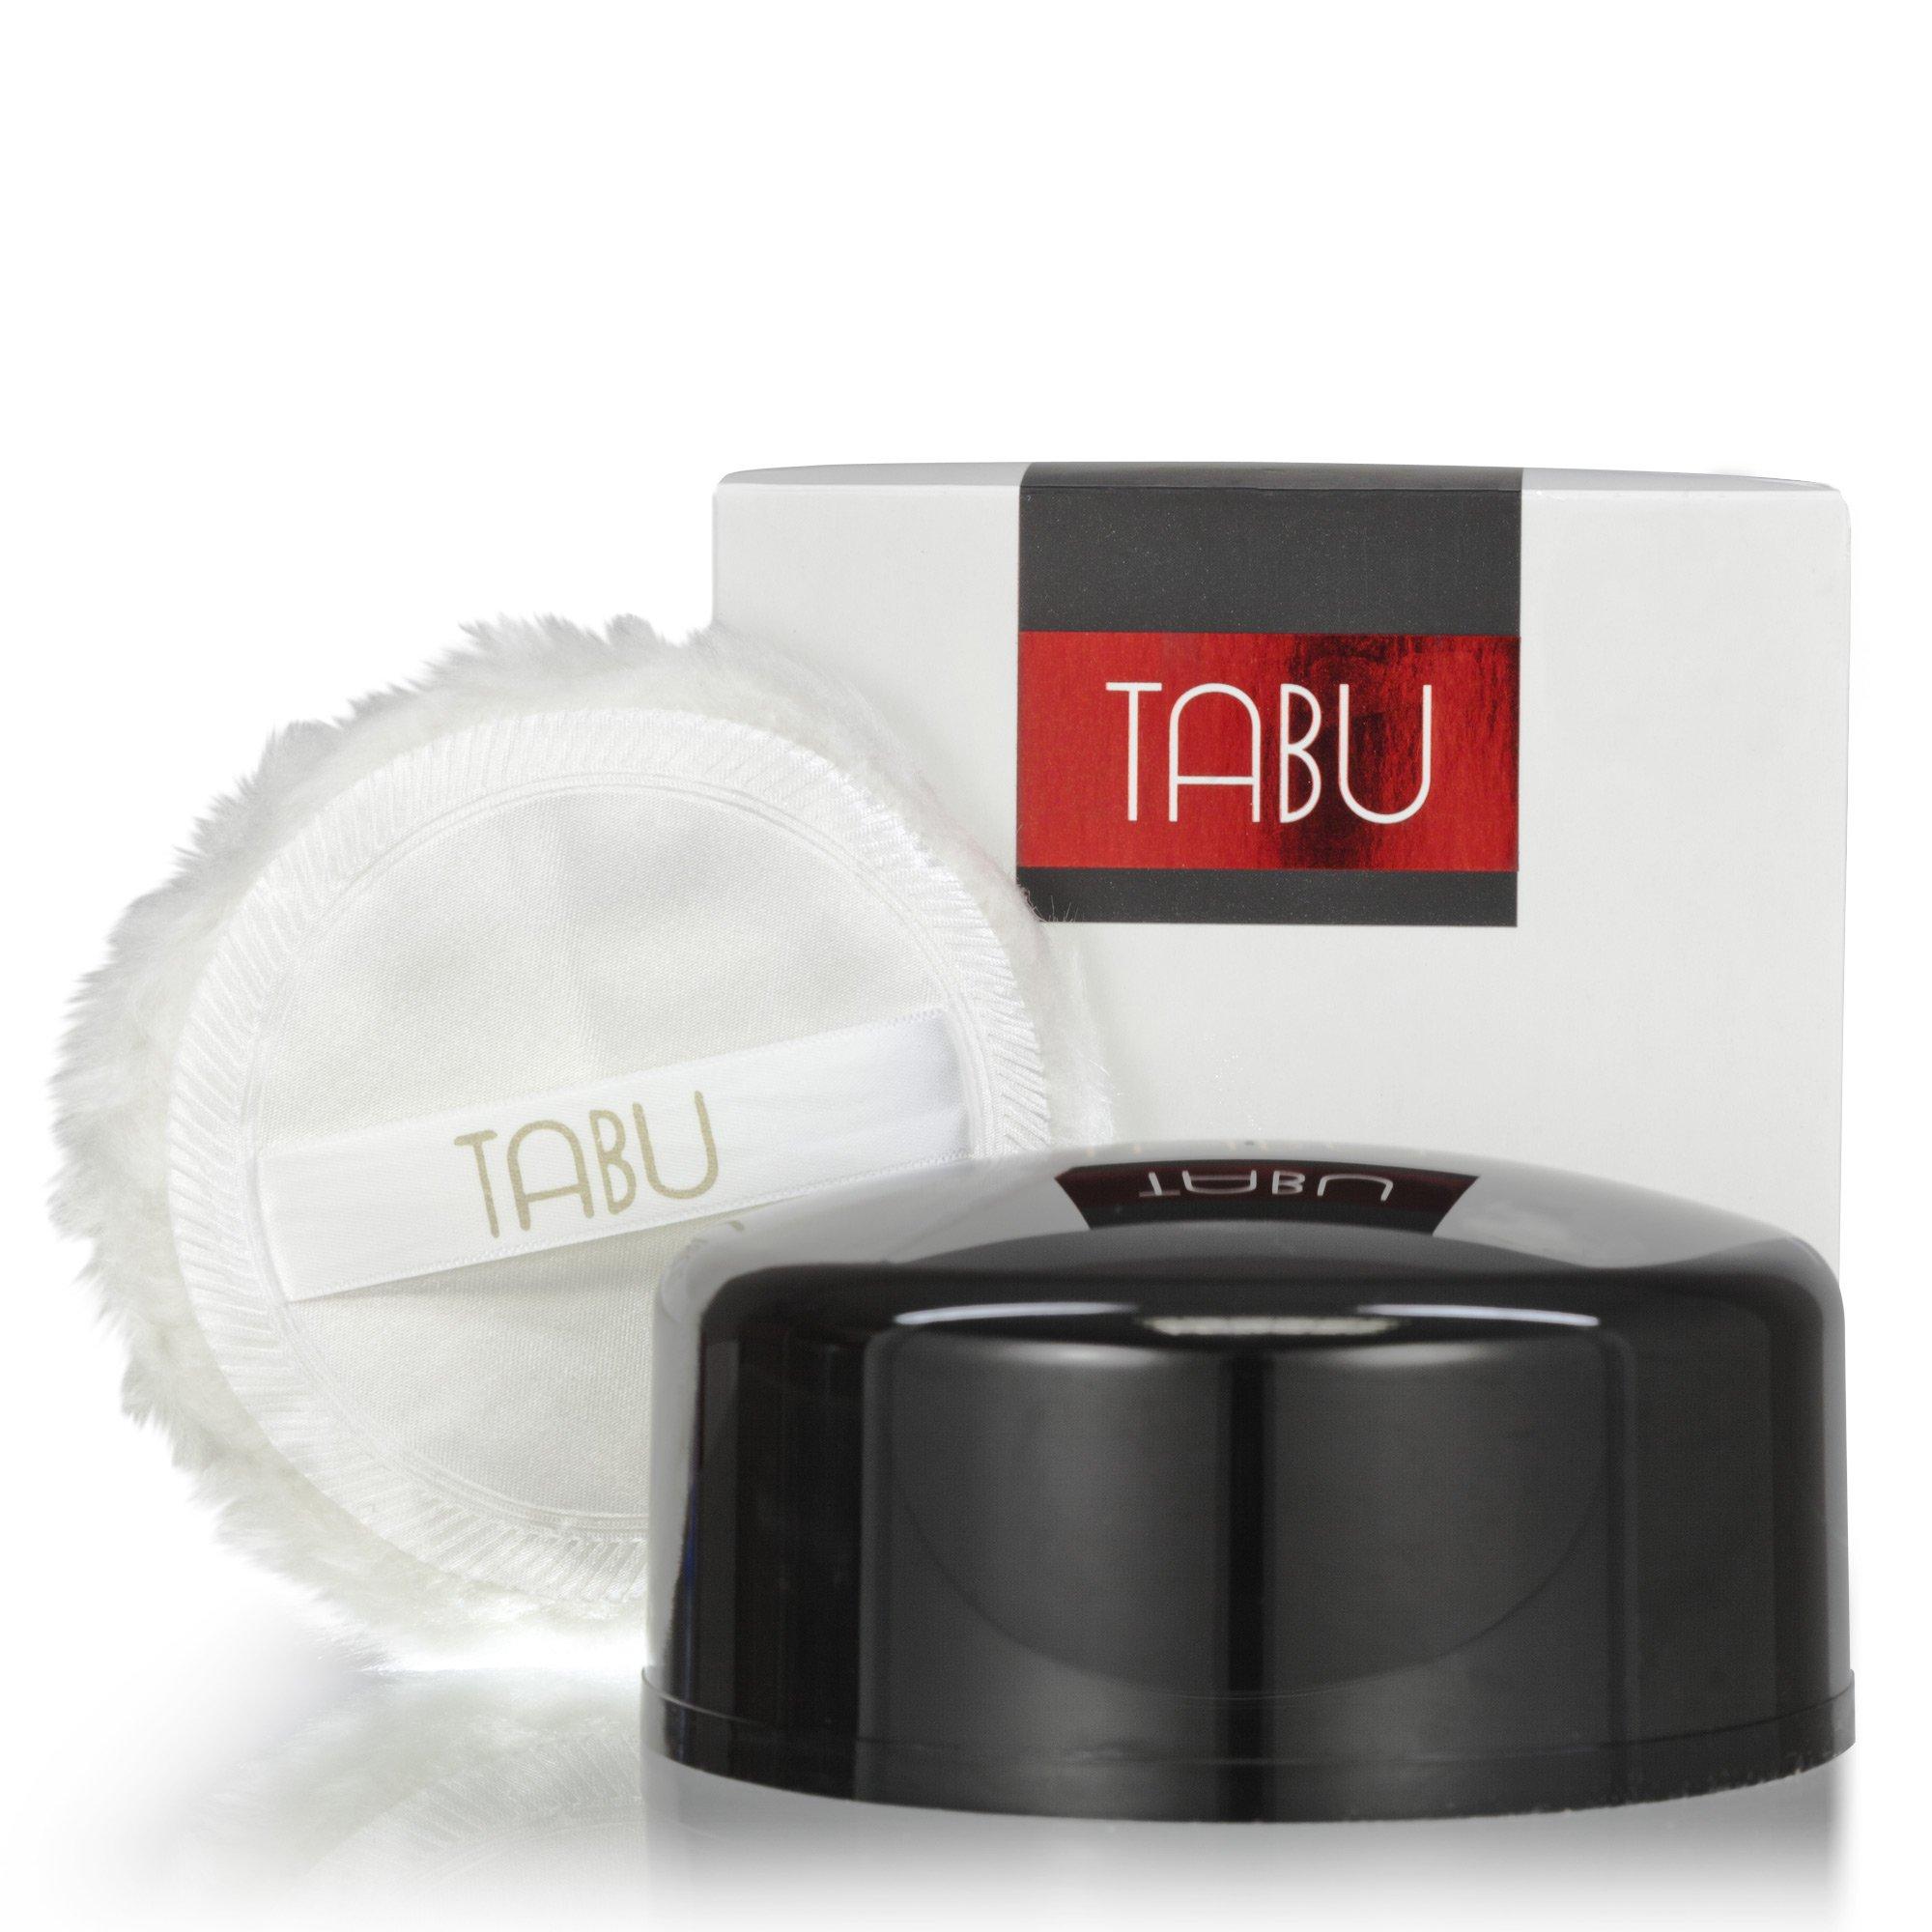 Tabu by Dana for Women 4.0 oz Dusting Powder by Dana Classic Fragrances